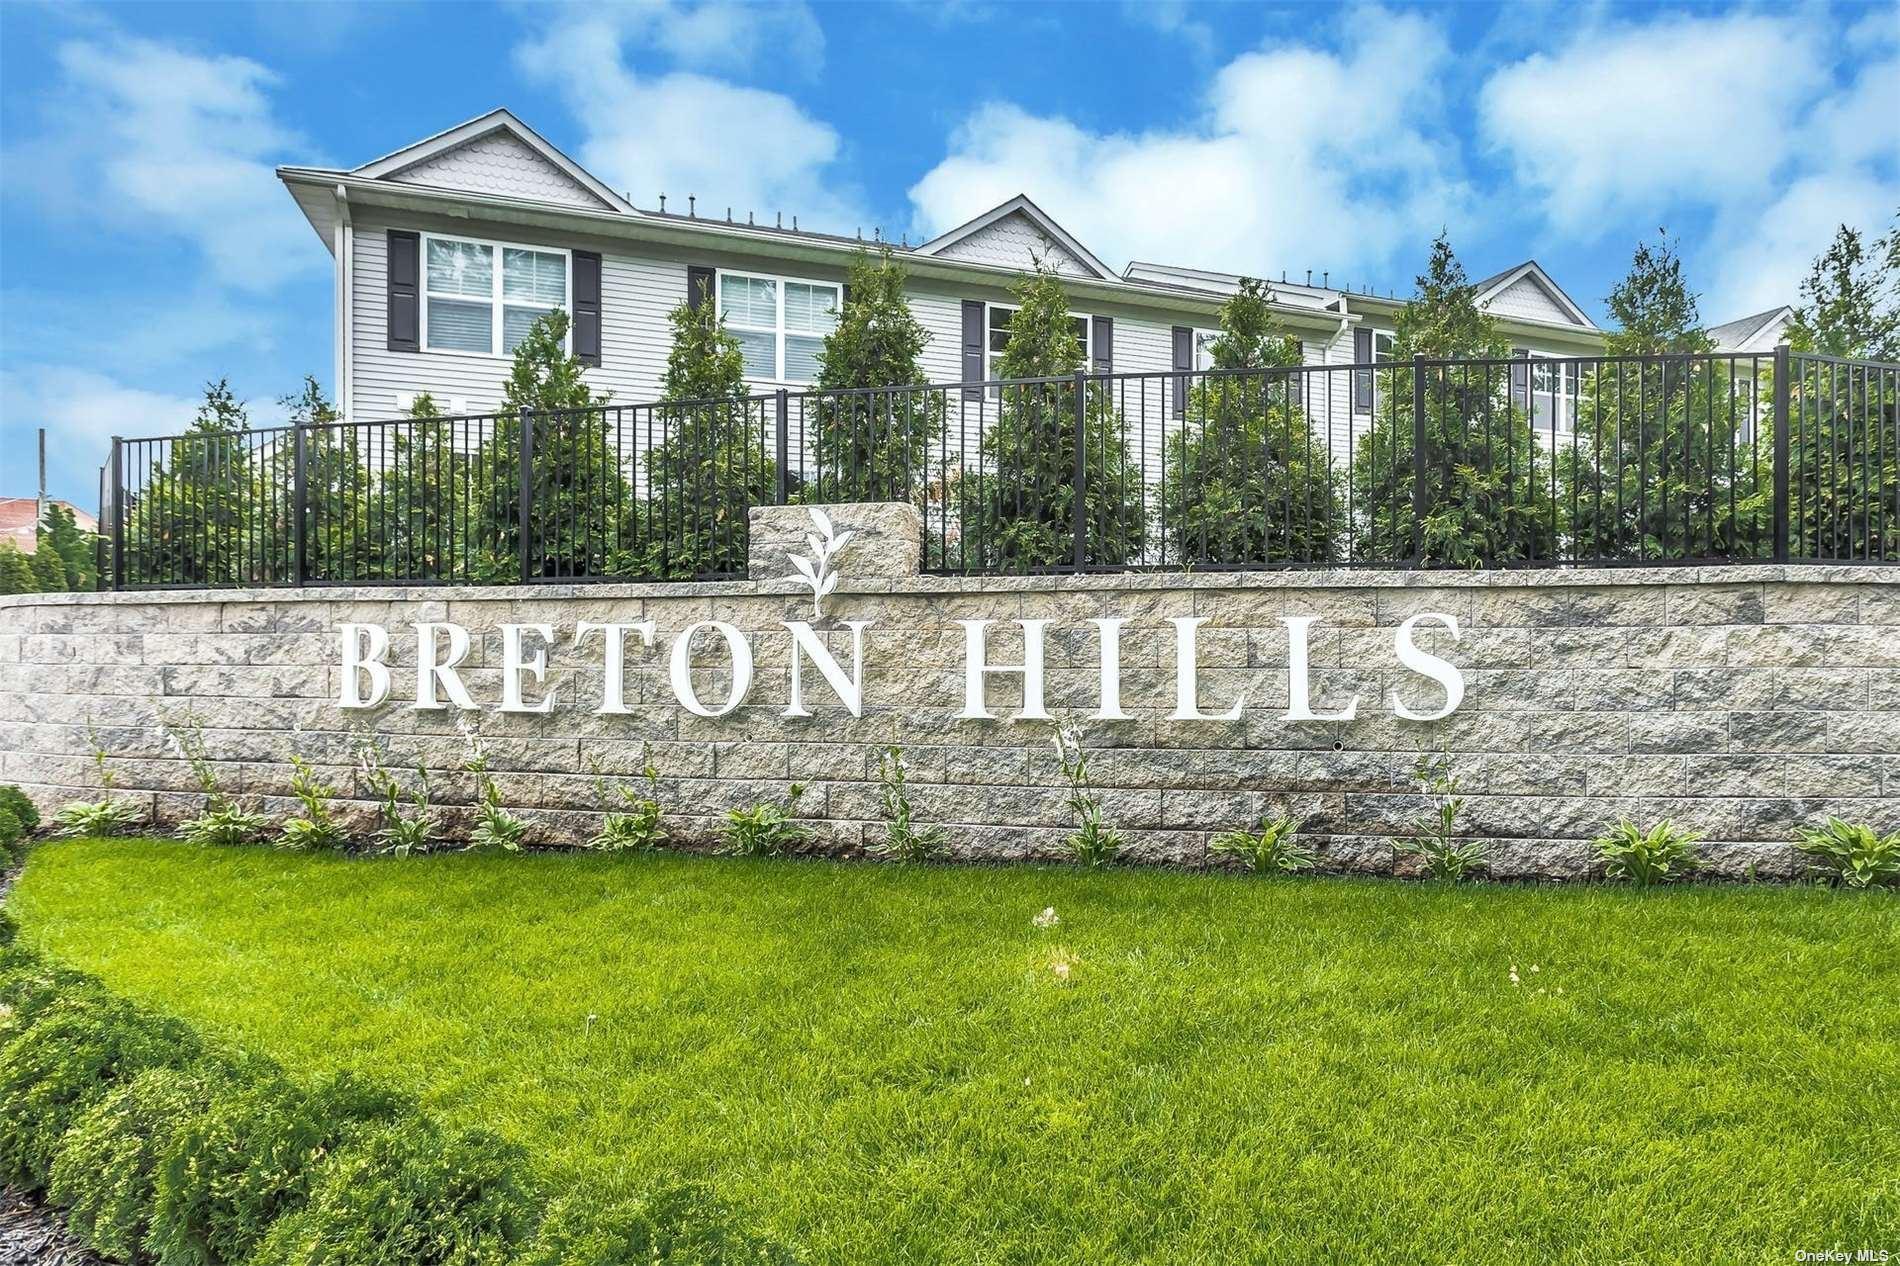 402 Breton Way #Upper, Glen Cove, NY 11542 - MLS#: 3326528